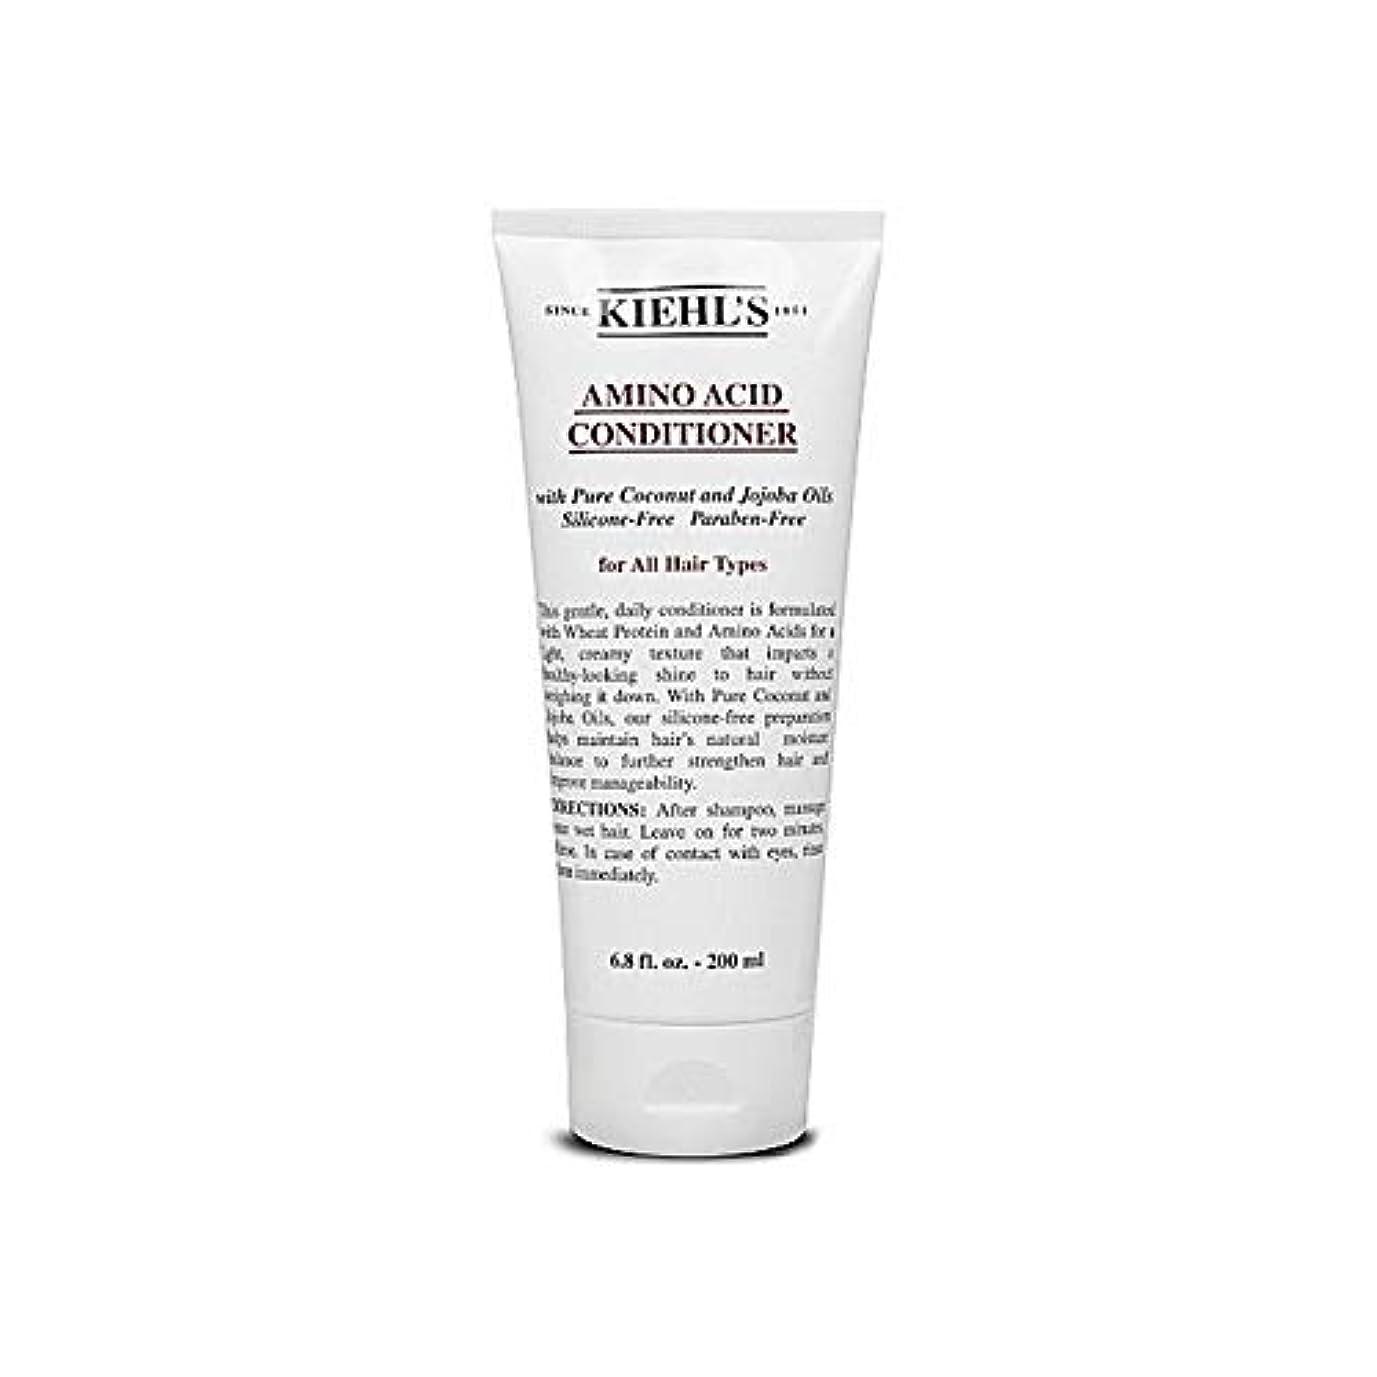 [Kiehl's ] キールズアミノ酸コンディショナー250Ml - Kiehl's Amino Acid Conditioner 250ml [並行輸入品]